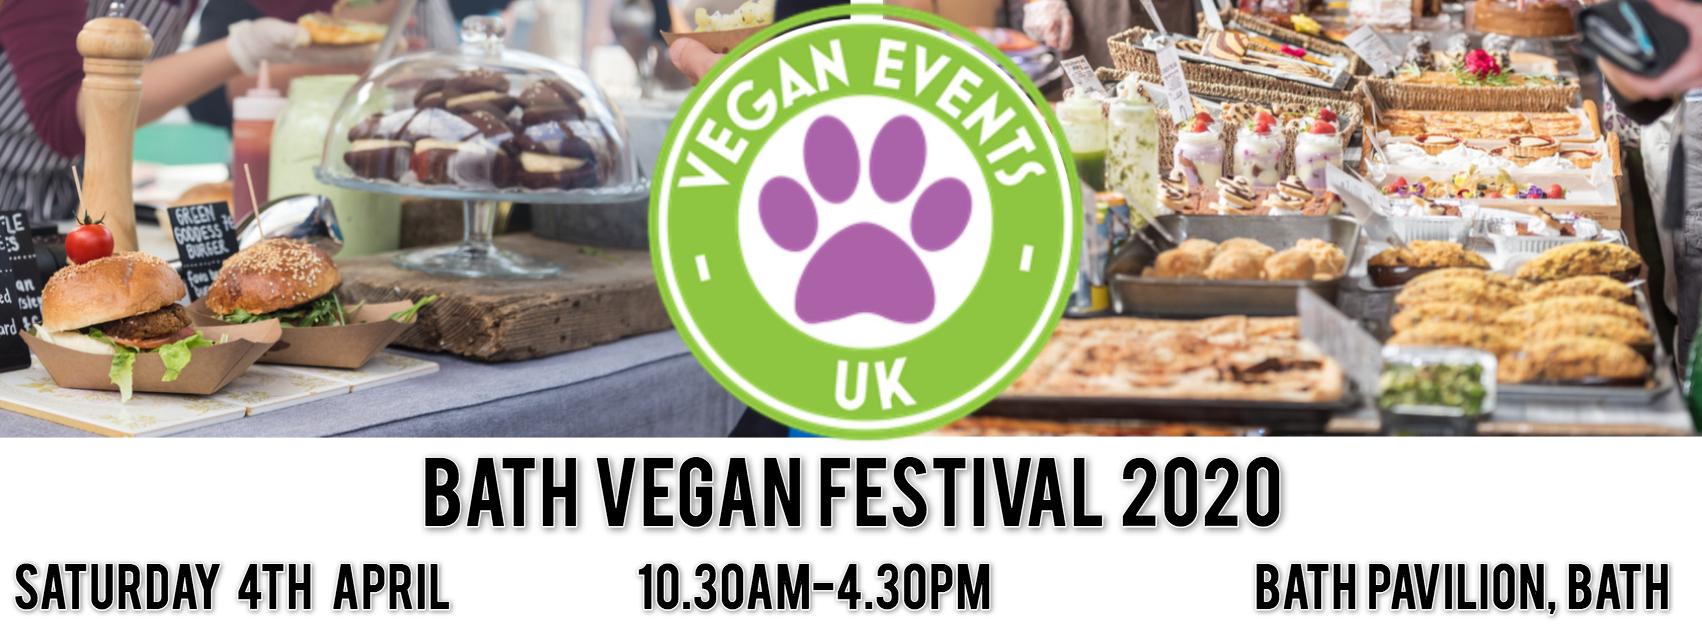 Vegan Festival 2020.Bath Vegan Festival